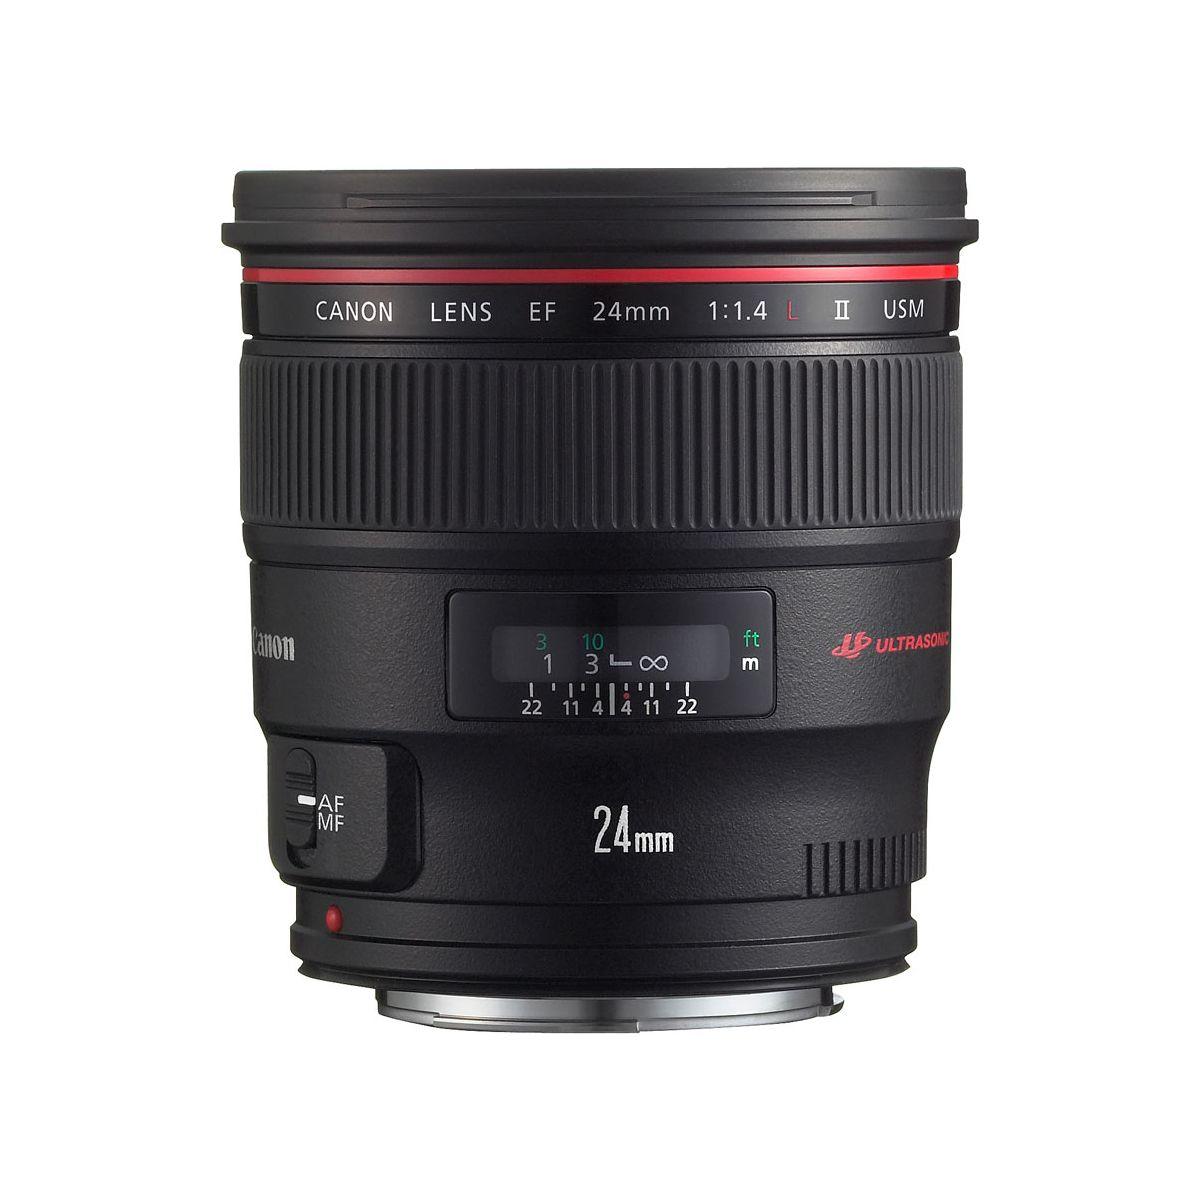 Objectif pour Reflex Plein Format CANON EF 24mm f/1.4 L II USM